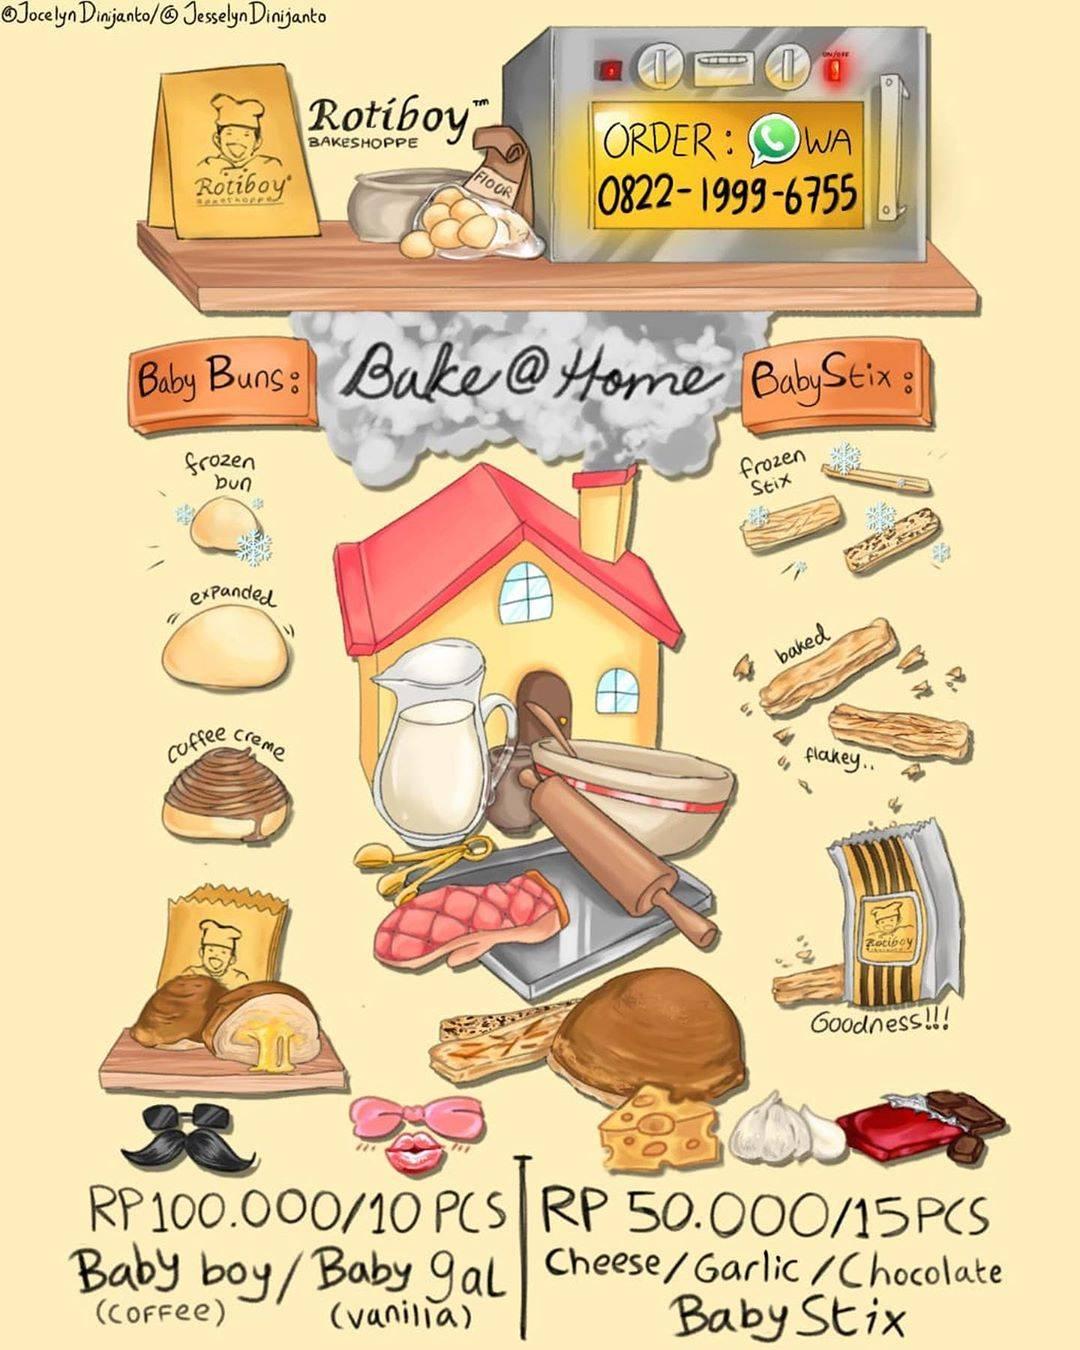 Diskon Roti Boy Promo Bake At Home Baby Girl/Boy & Baby Stix Cuma Rp. 100.000 & Rp. 50.000